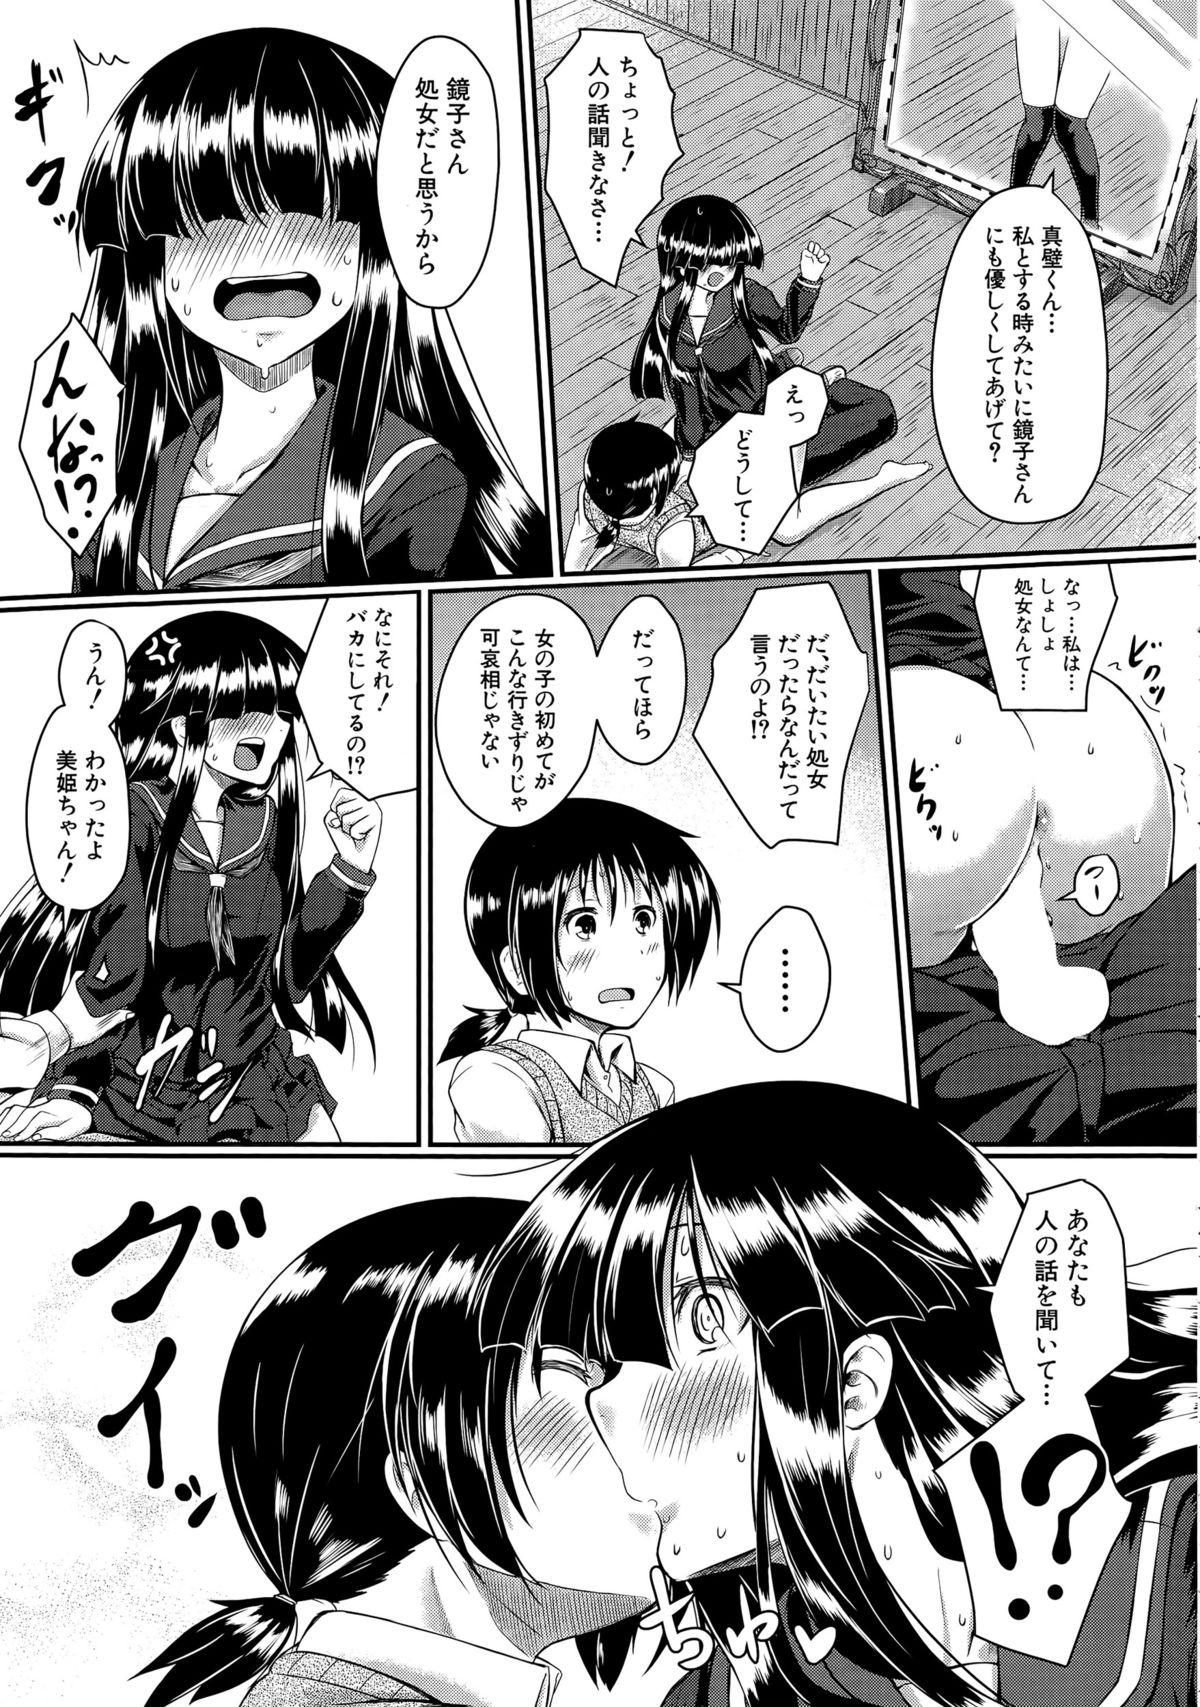 COMIC Mugen Tensei 2015-05 409